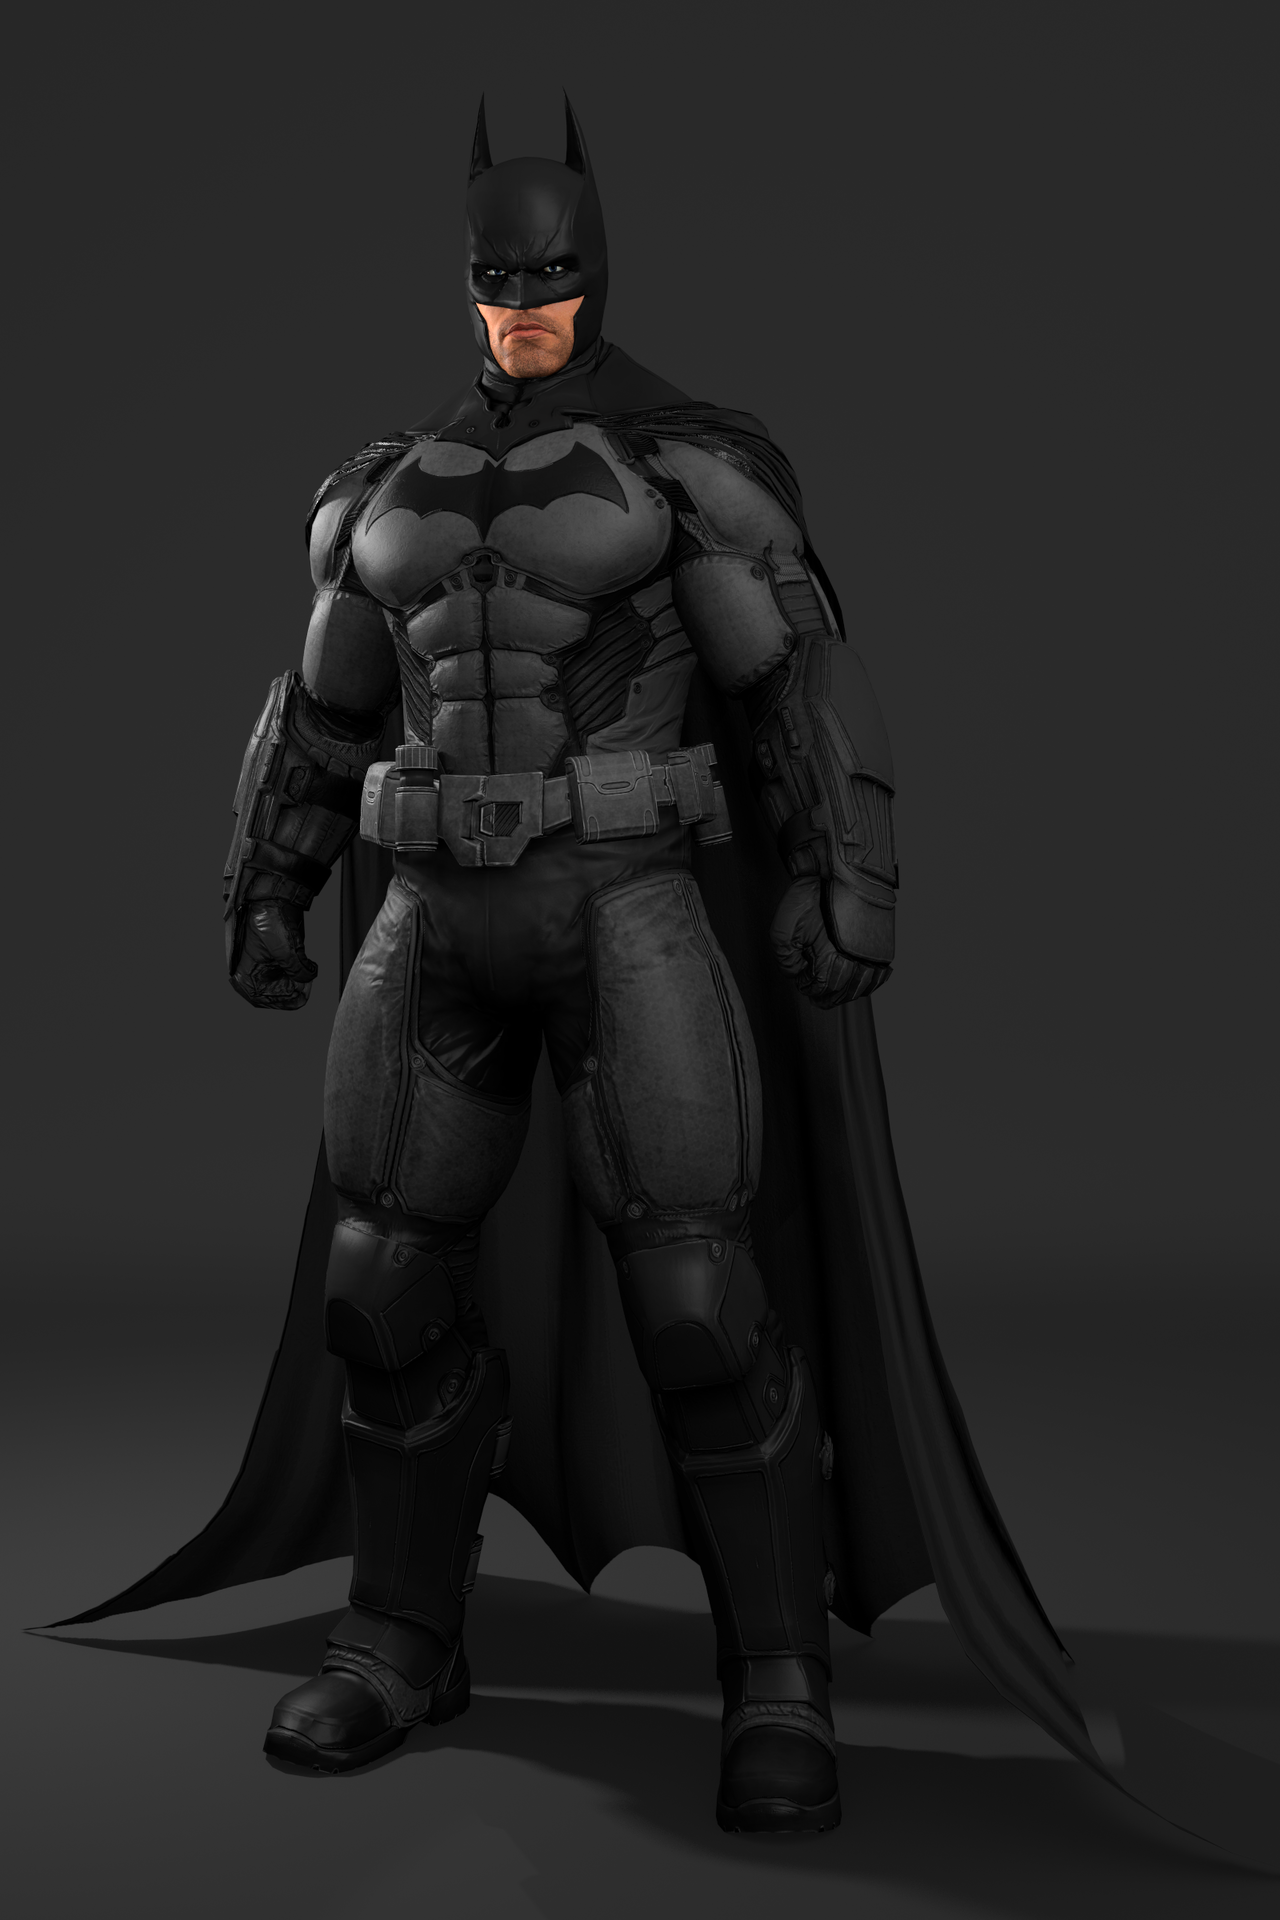 Batman Arkham Origins - Batman by IshikaHiruma on DeviantArt